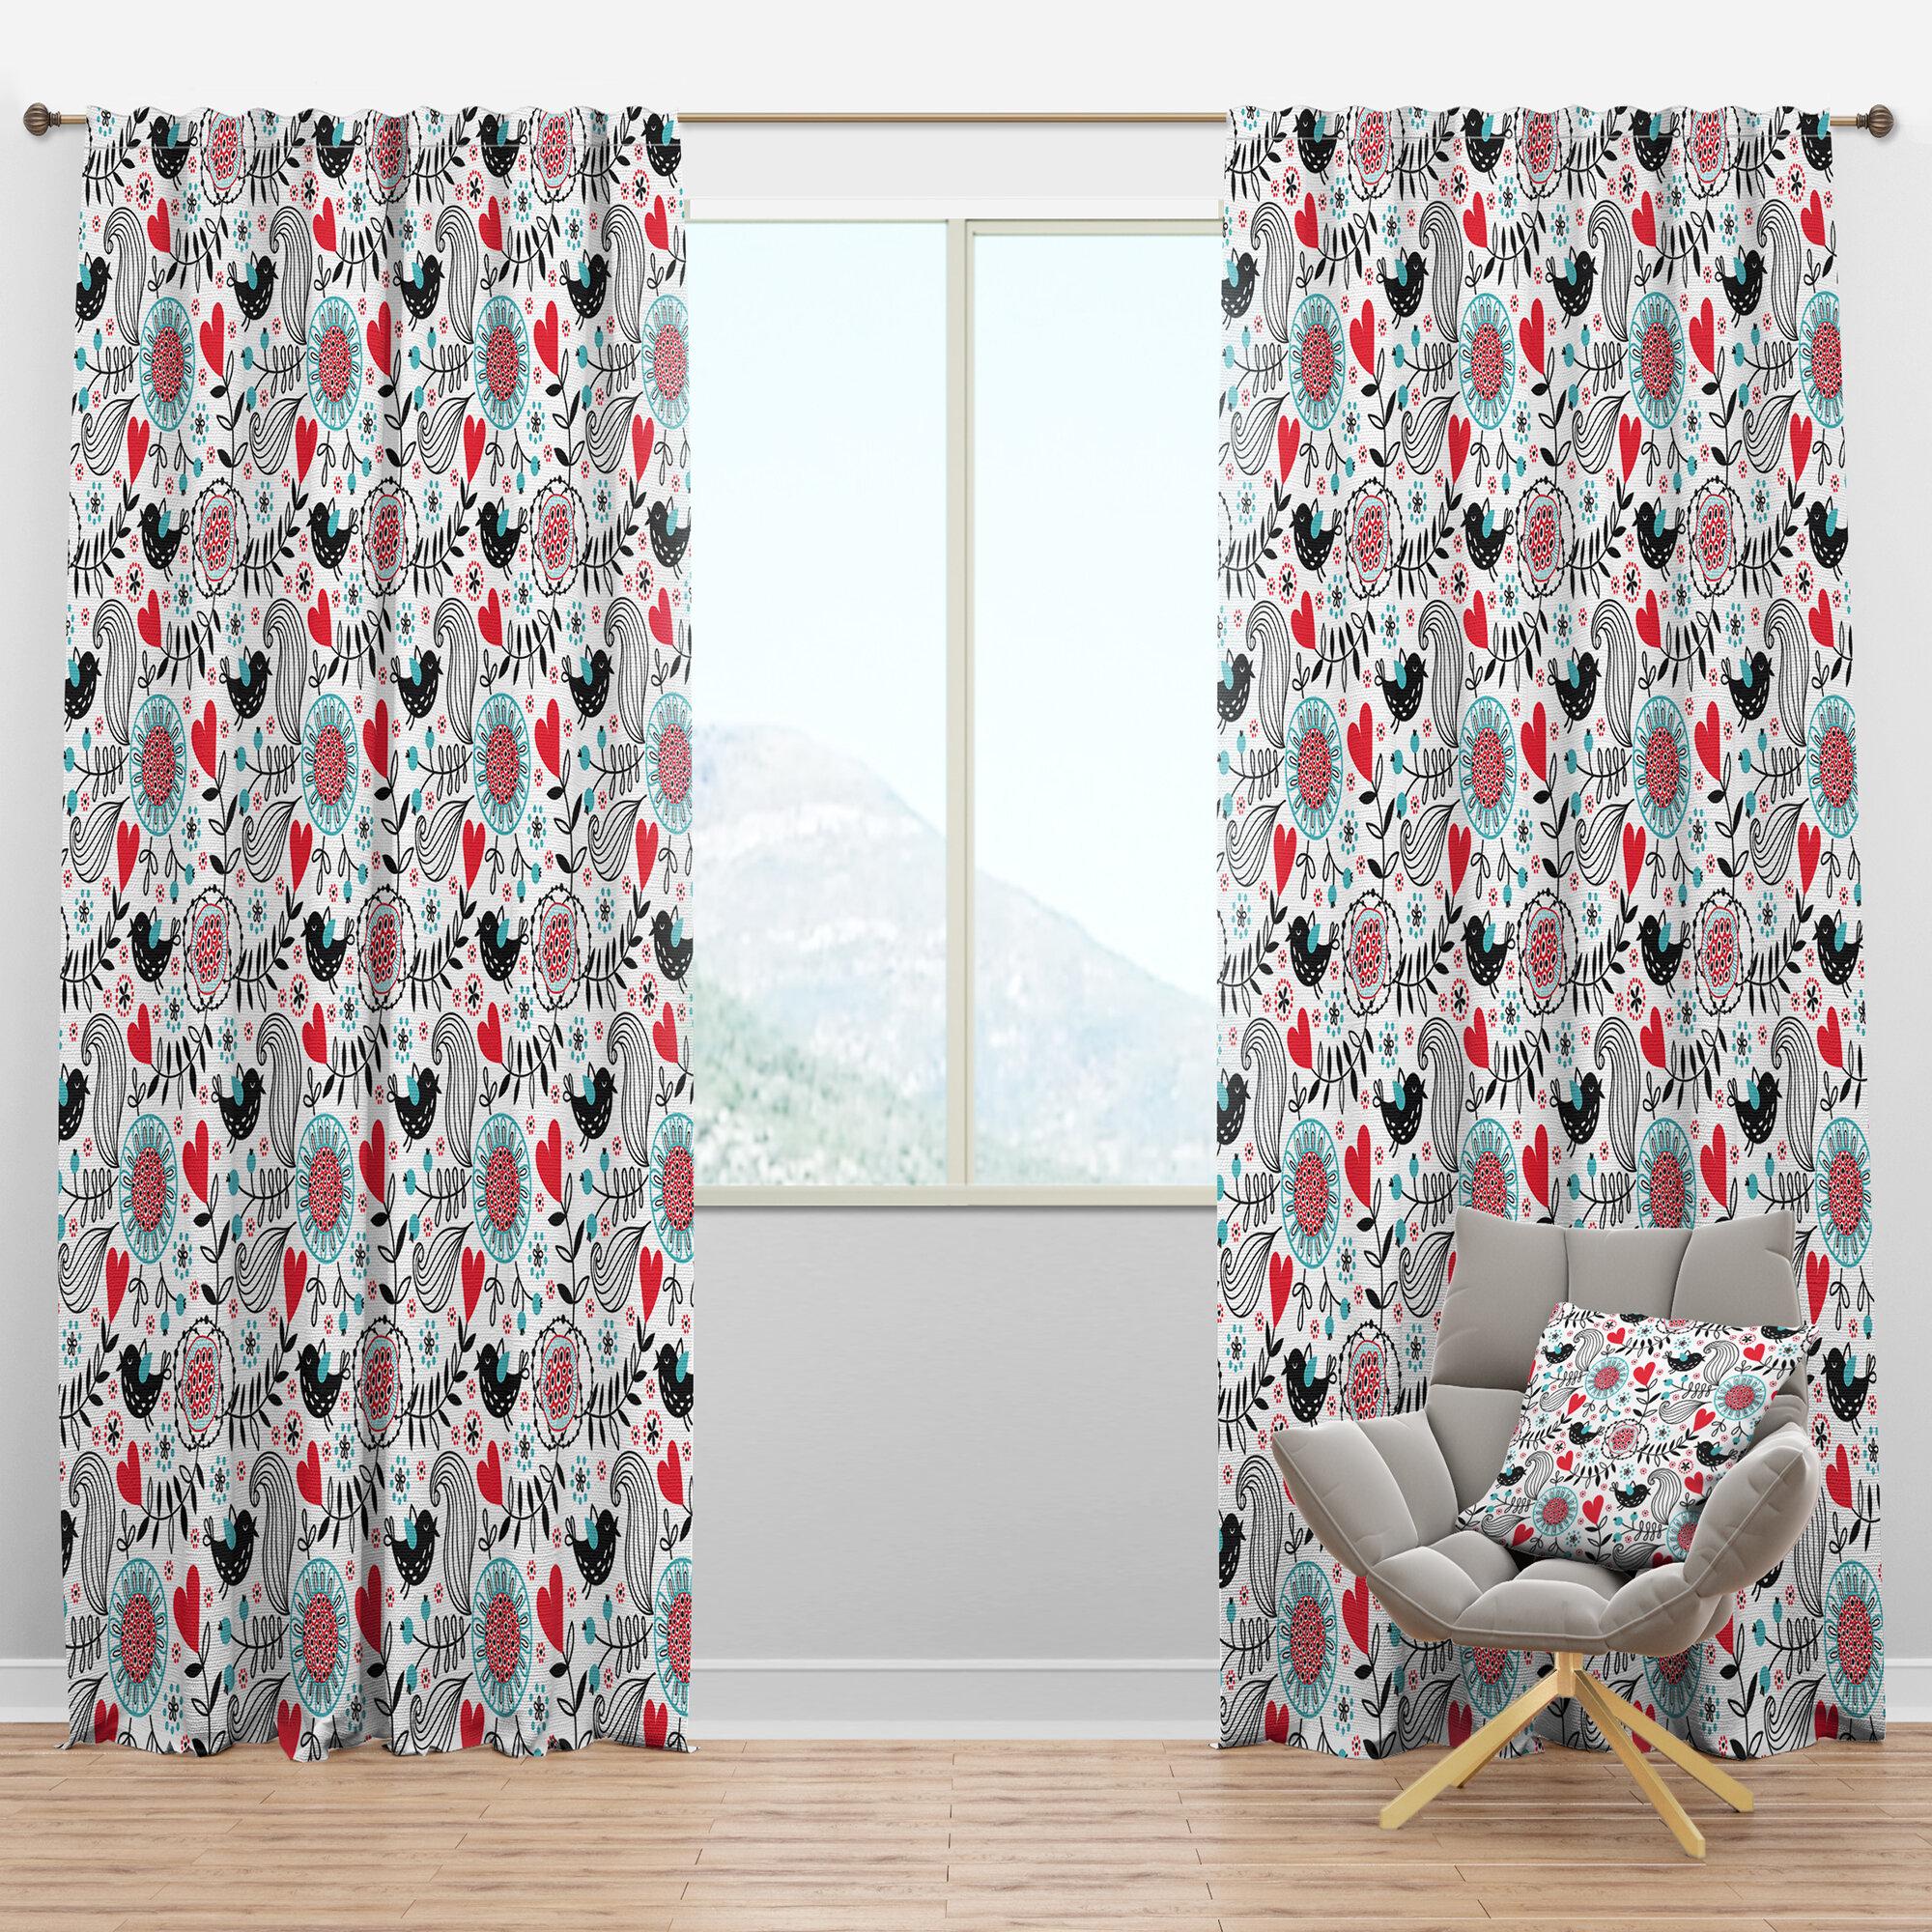 Designart Romantic Floral Semi Sheer Thermal Rod Pocket Curtain Panel Wayfair